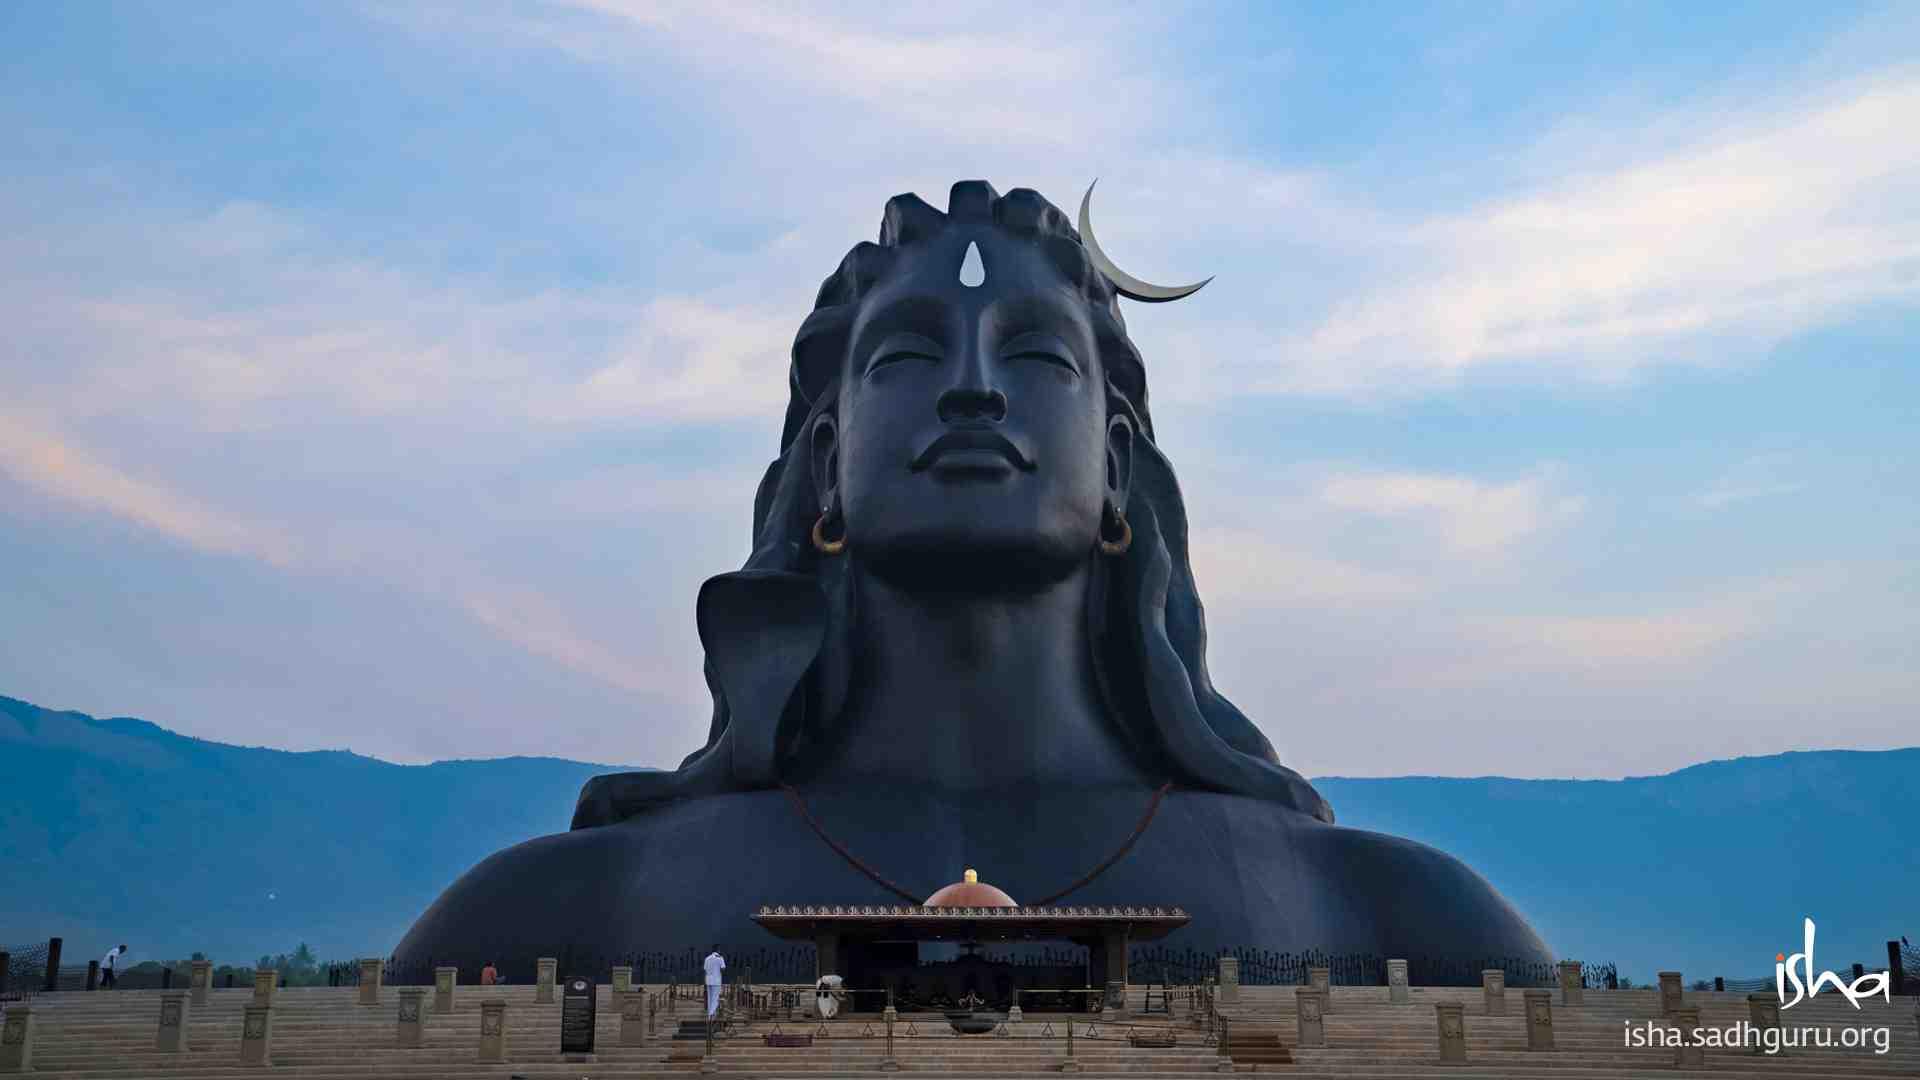 Shiva Wallpaper of 112ft Adiyogi statue version 4